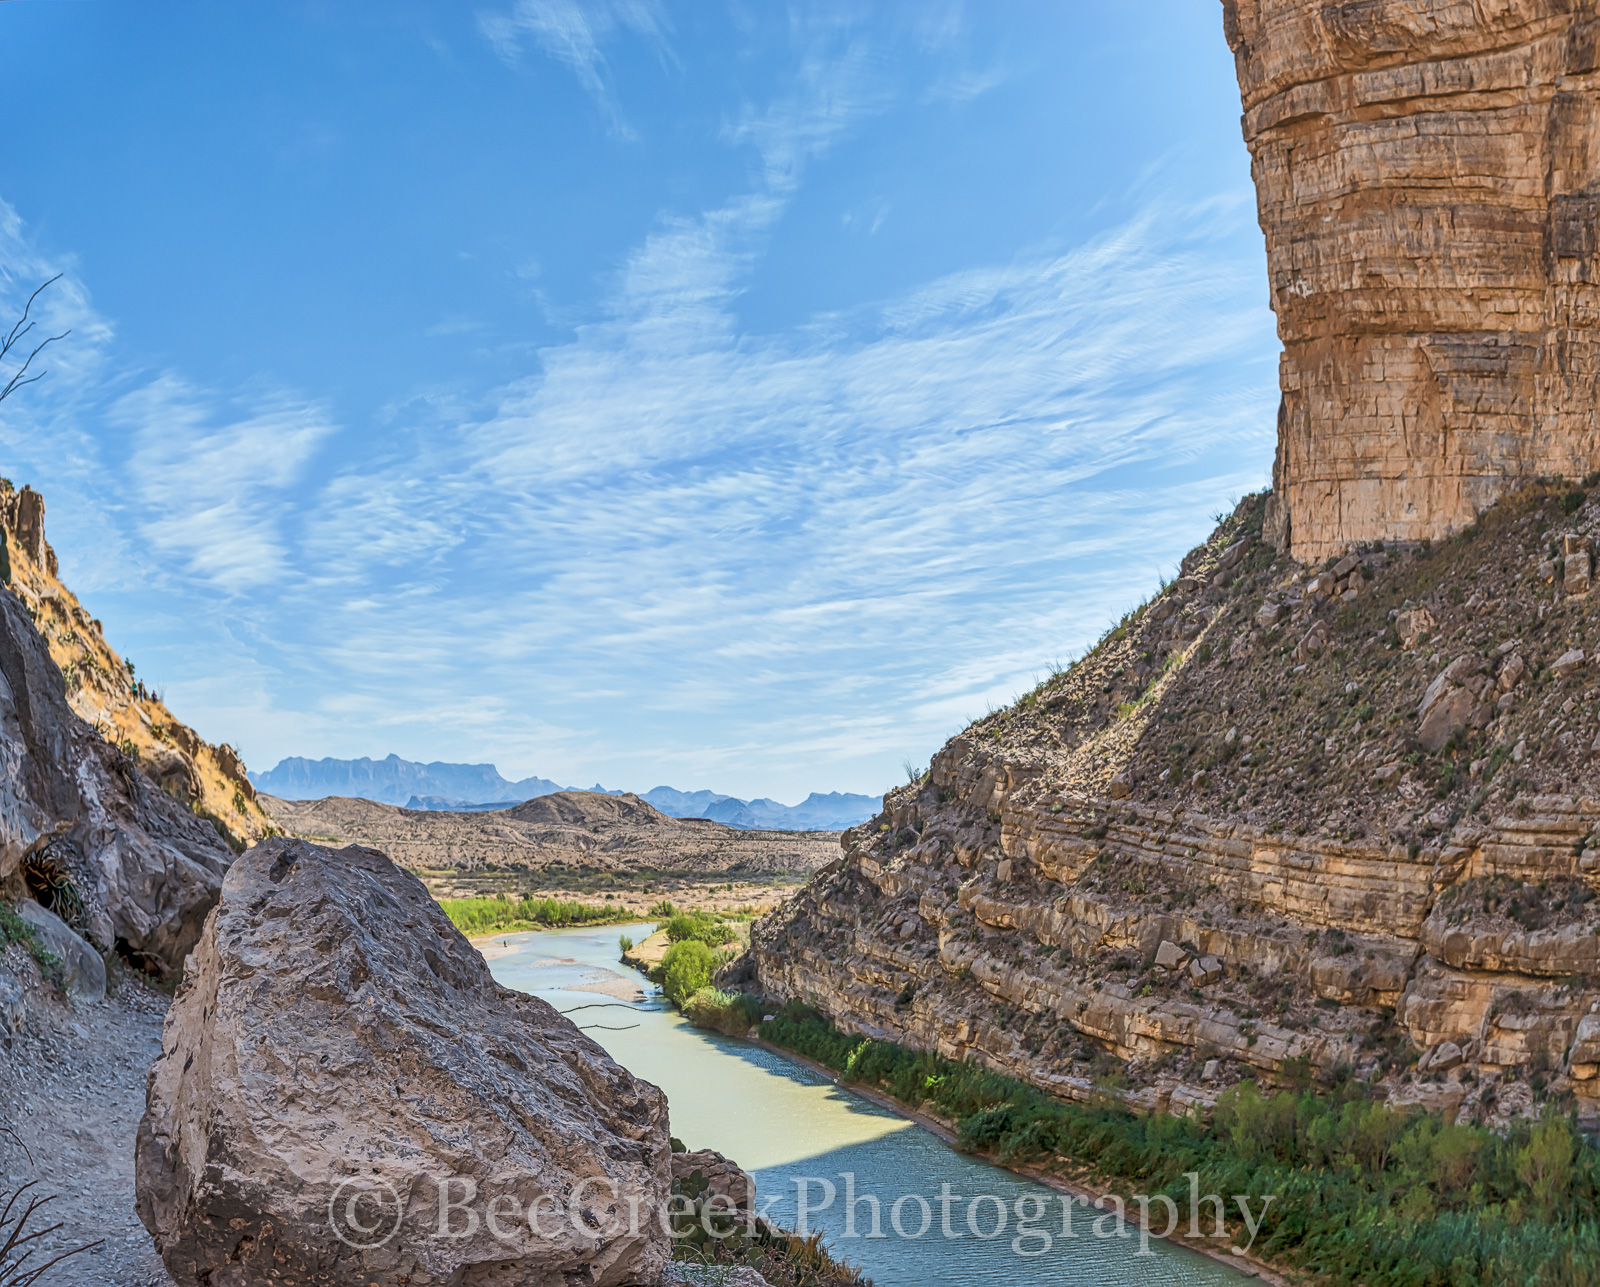 Mountains, Santa Elena Canyons, boulder, pano, panorama, rio grande river landscape, rock, photo